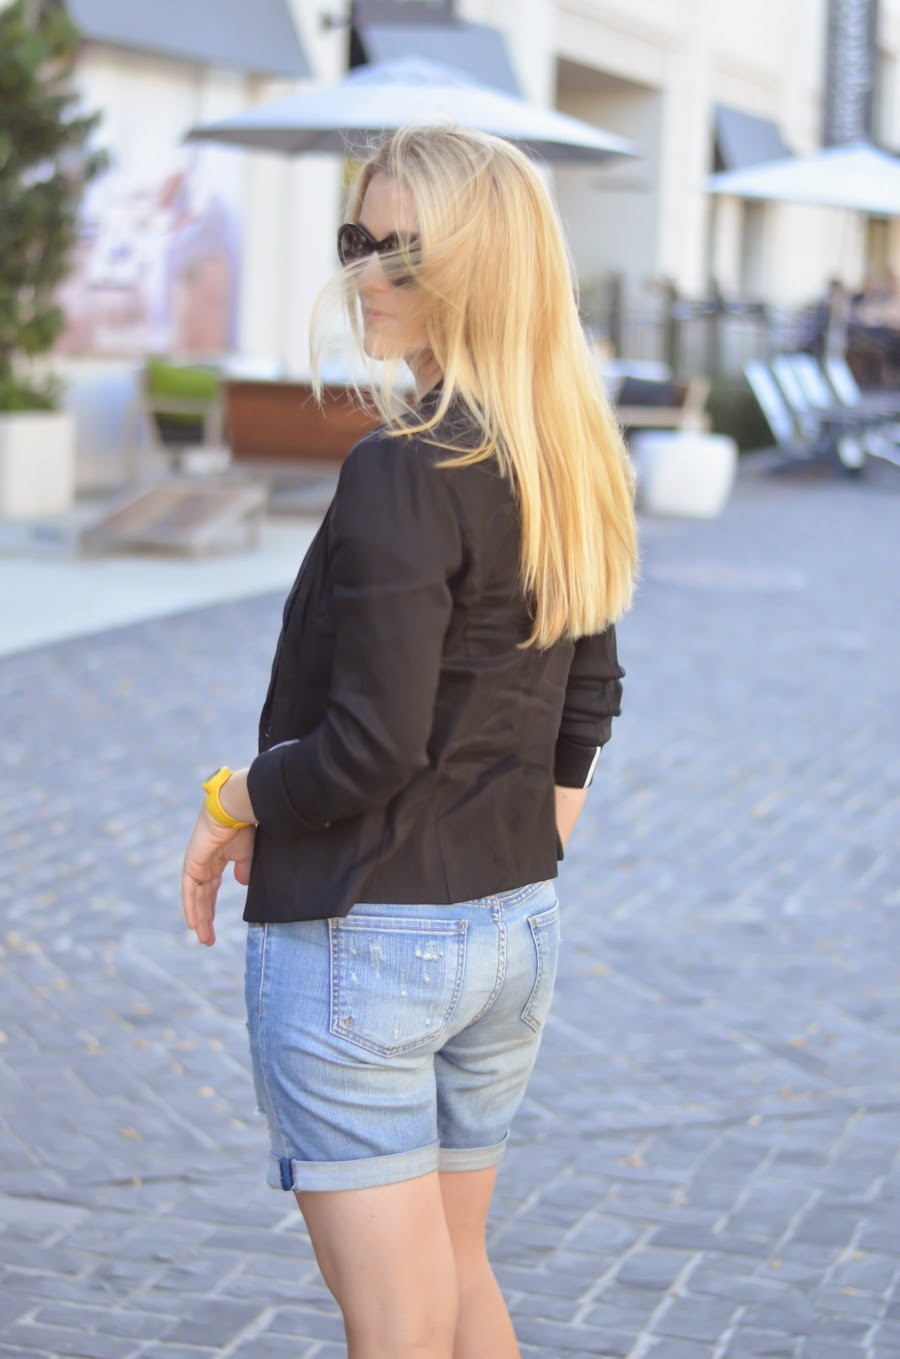 Black Linen Blazer + Distressed Shorts at @lucismorsels